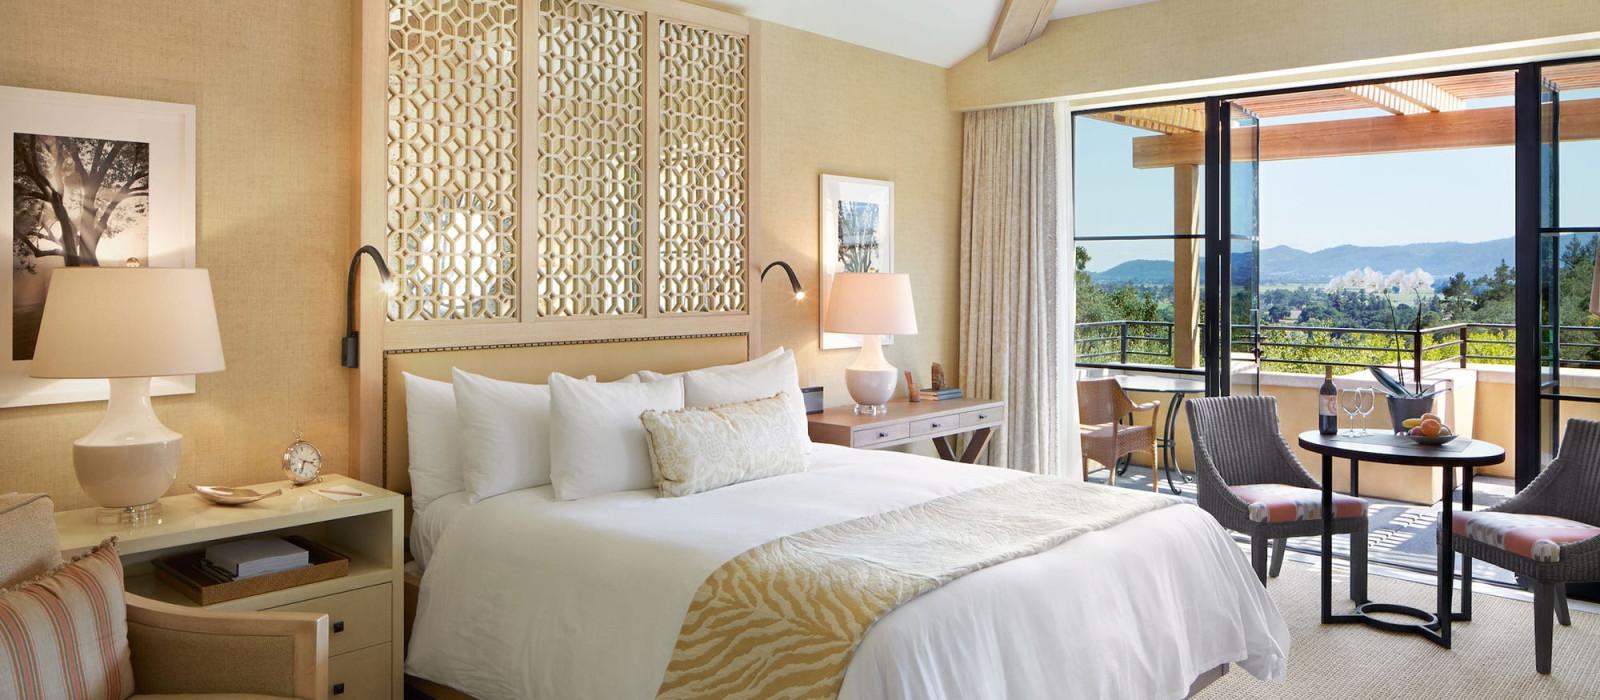 Hotel Auberge du Soleil USA